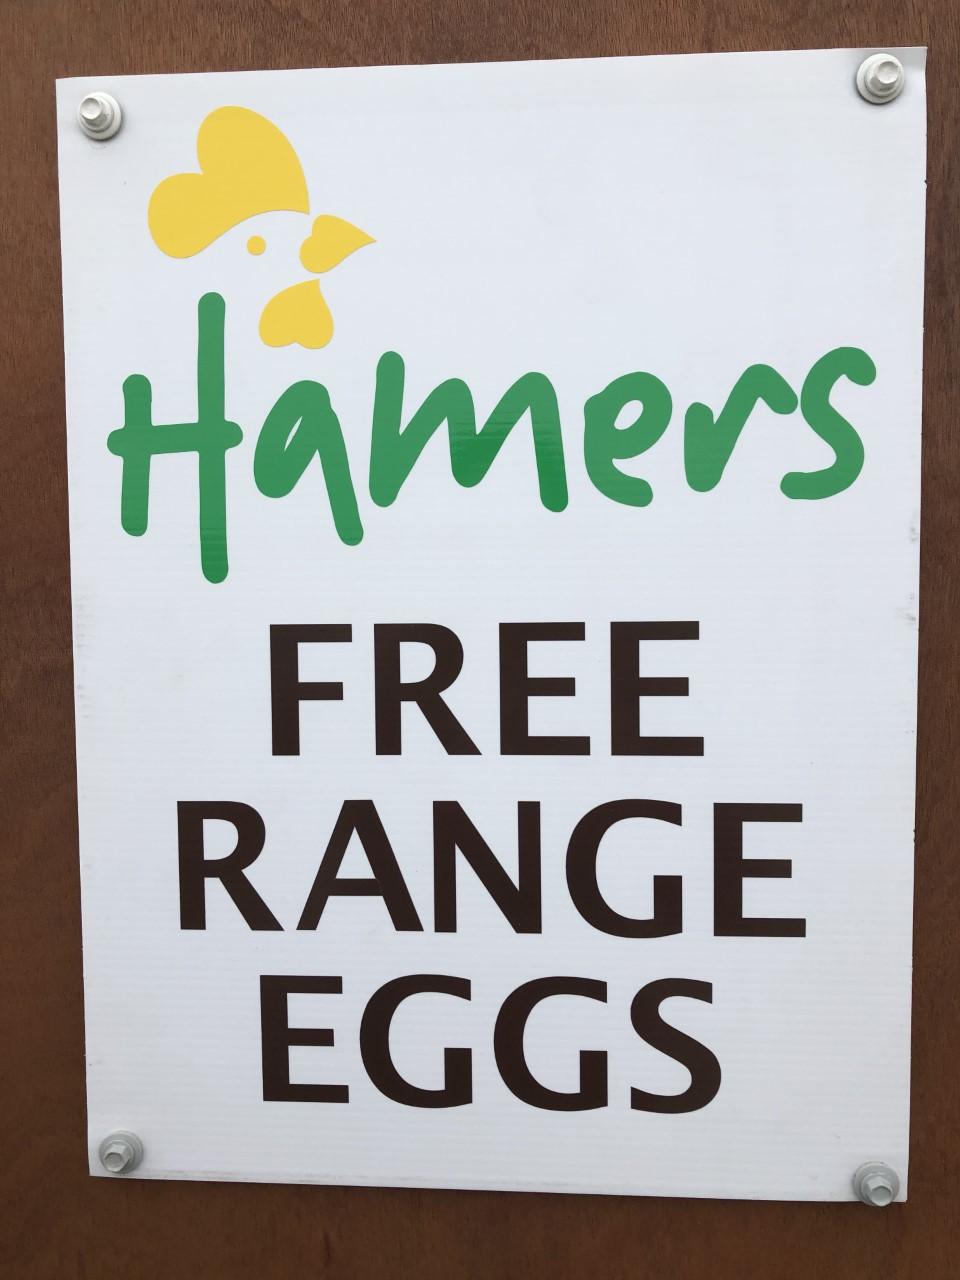 Hamers free range eggs x12